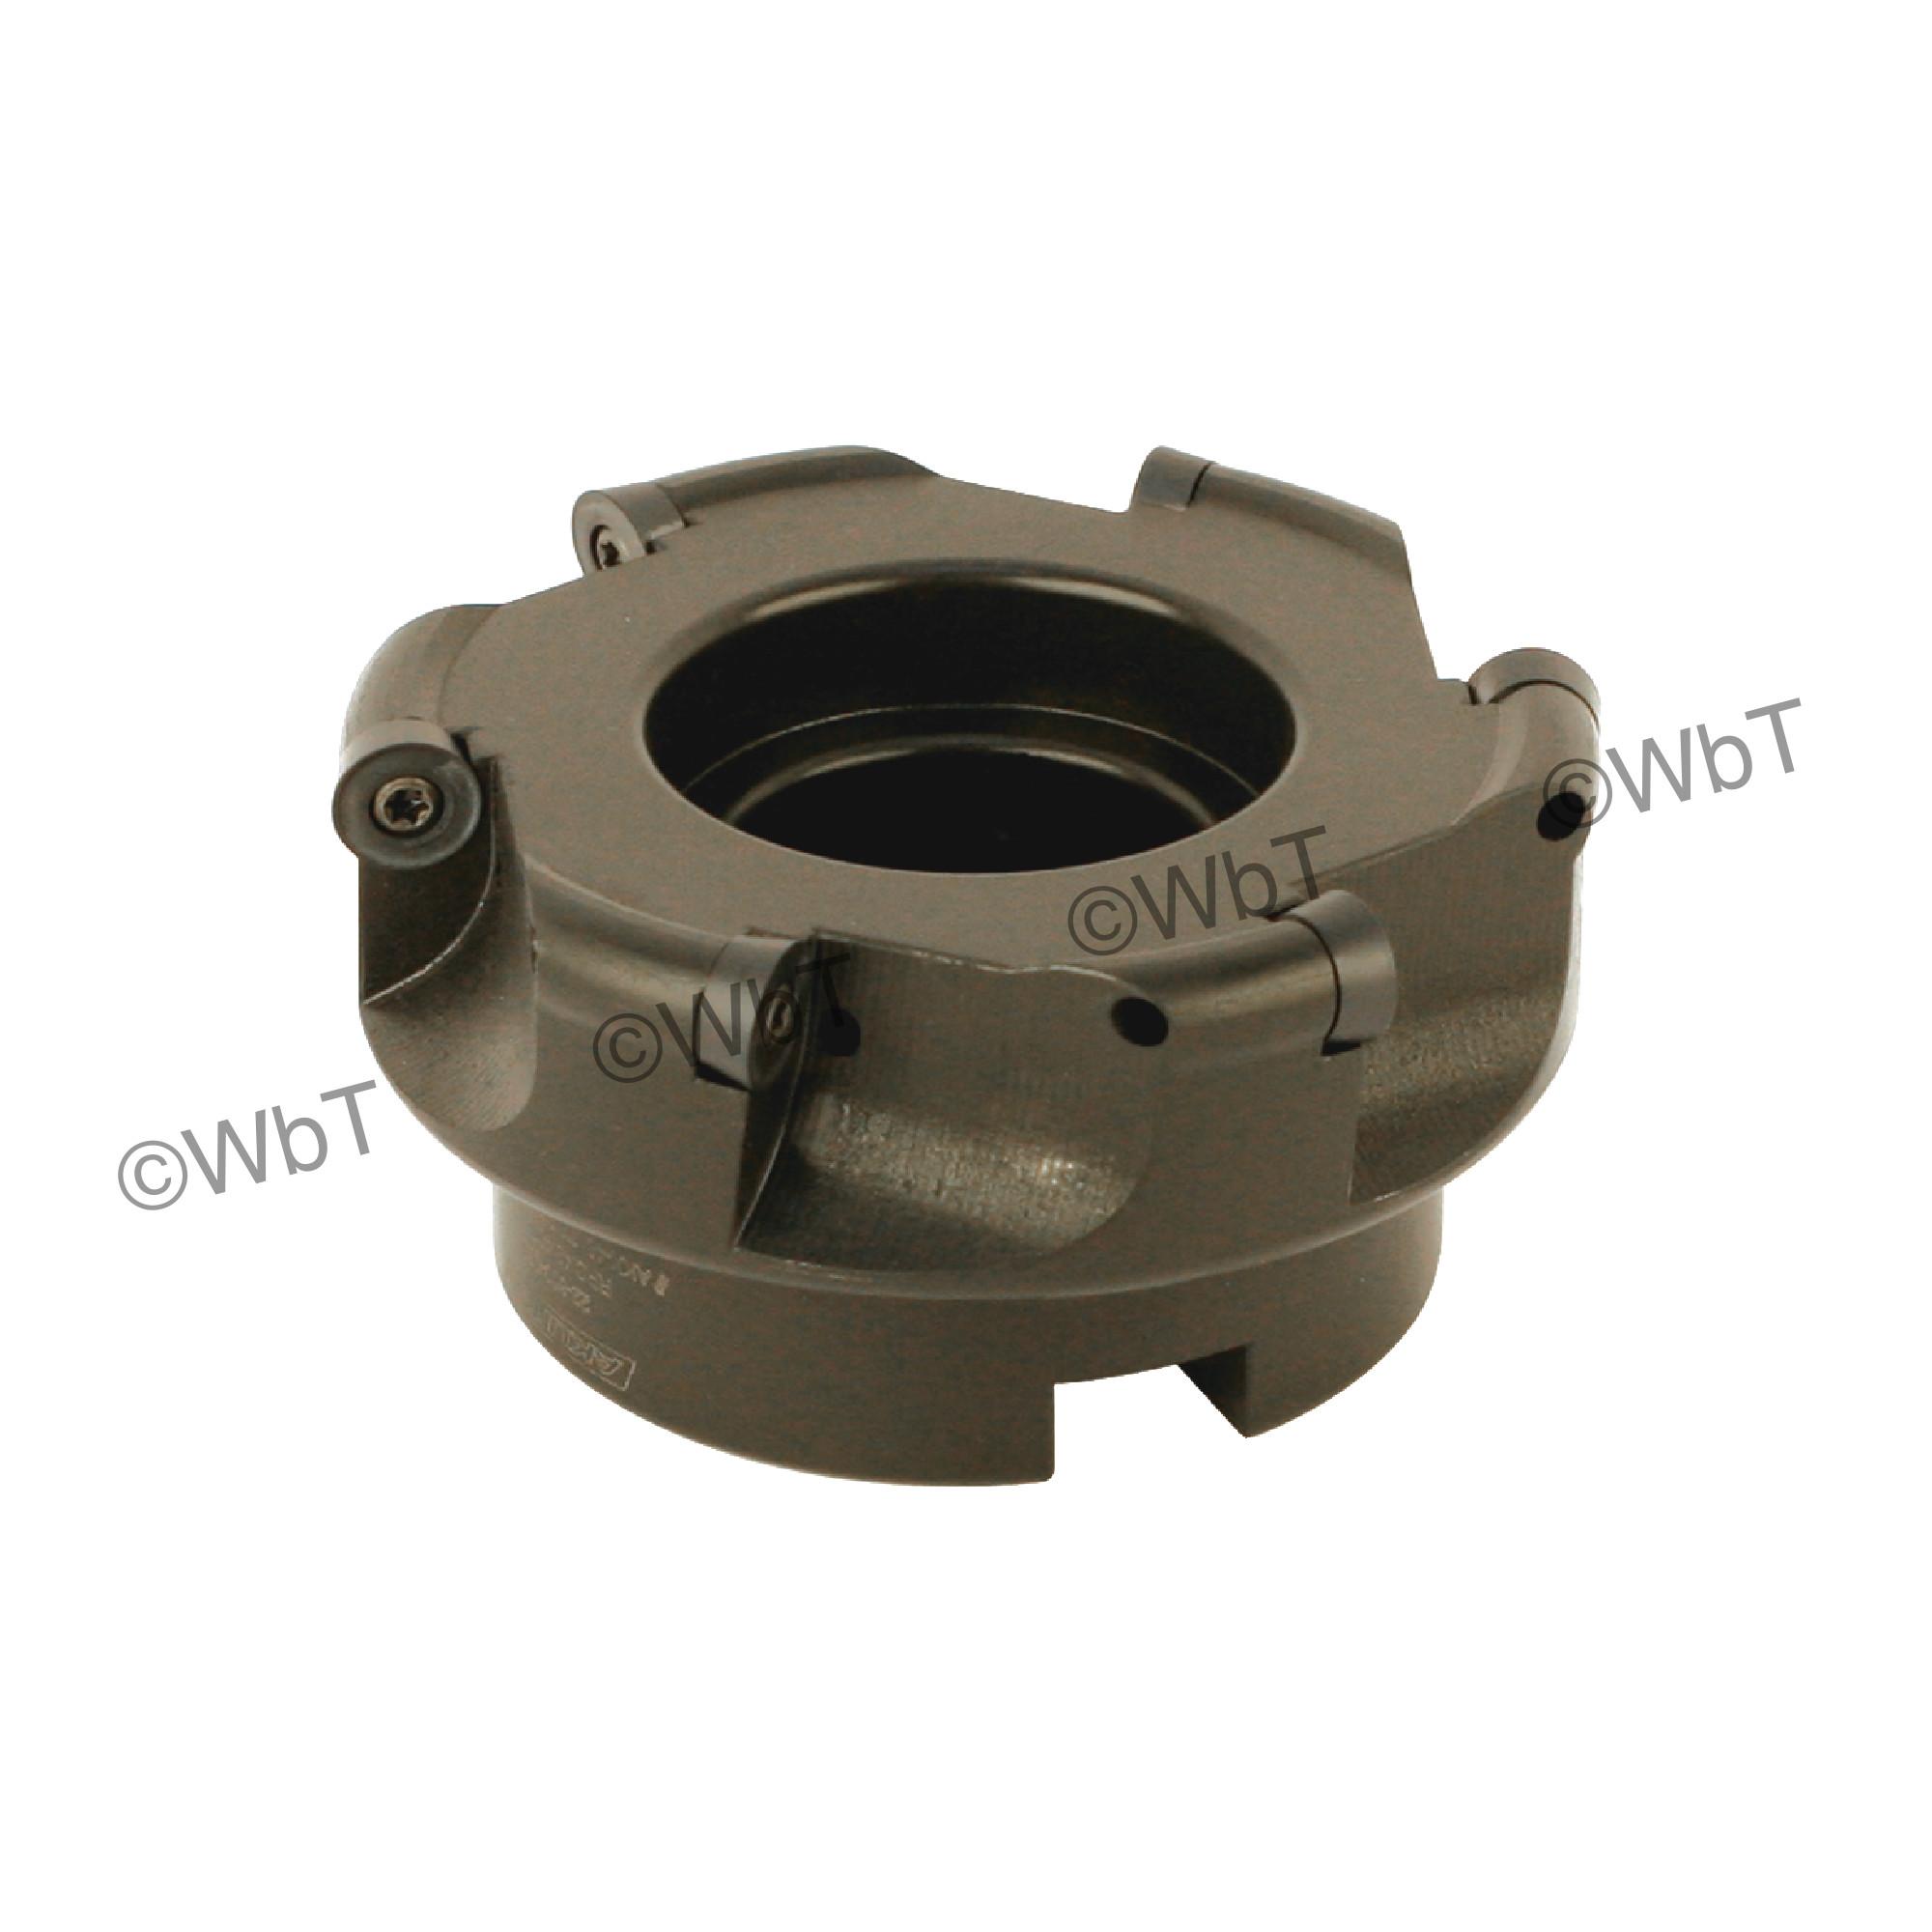 "AKUMA - 4.000"" Face Mill Set / Includes: (1) RPC.43.400R-6 (4.0""ø) & (10) RPMT1204M0S-M1 PM20M Coated Inserts / R"